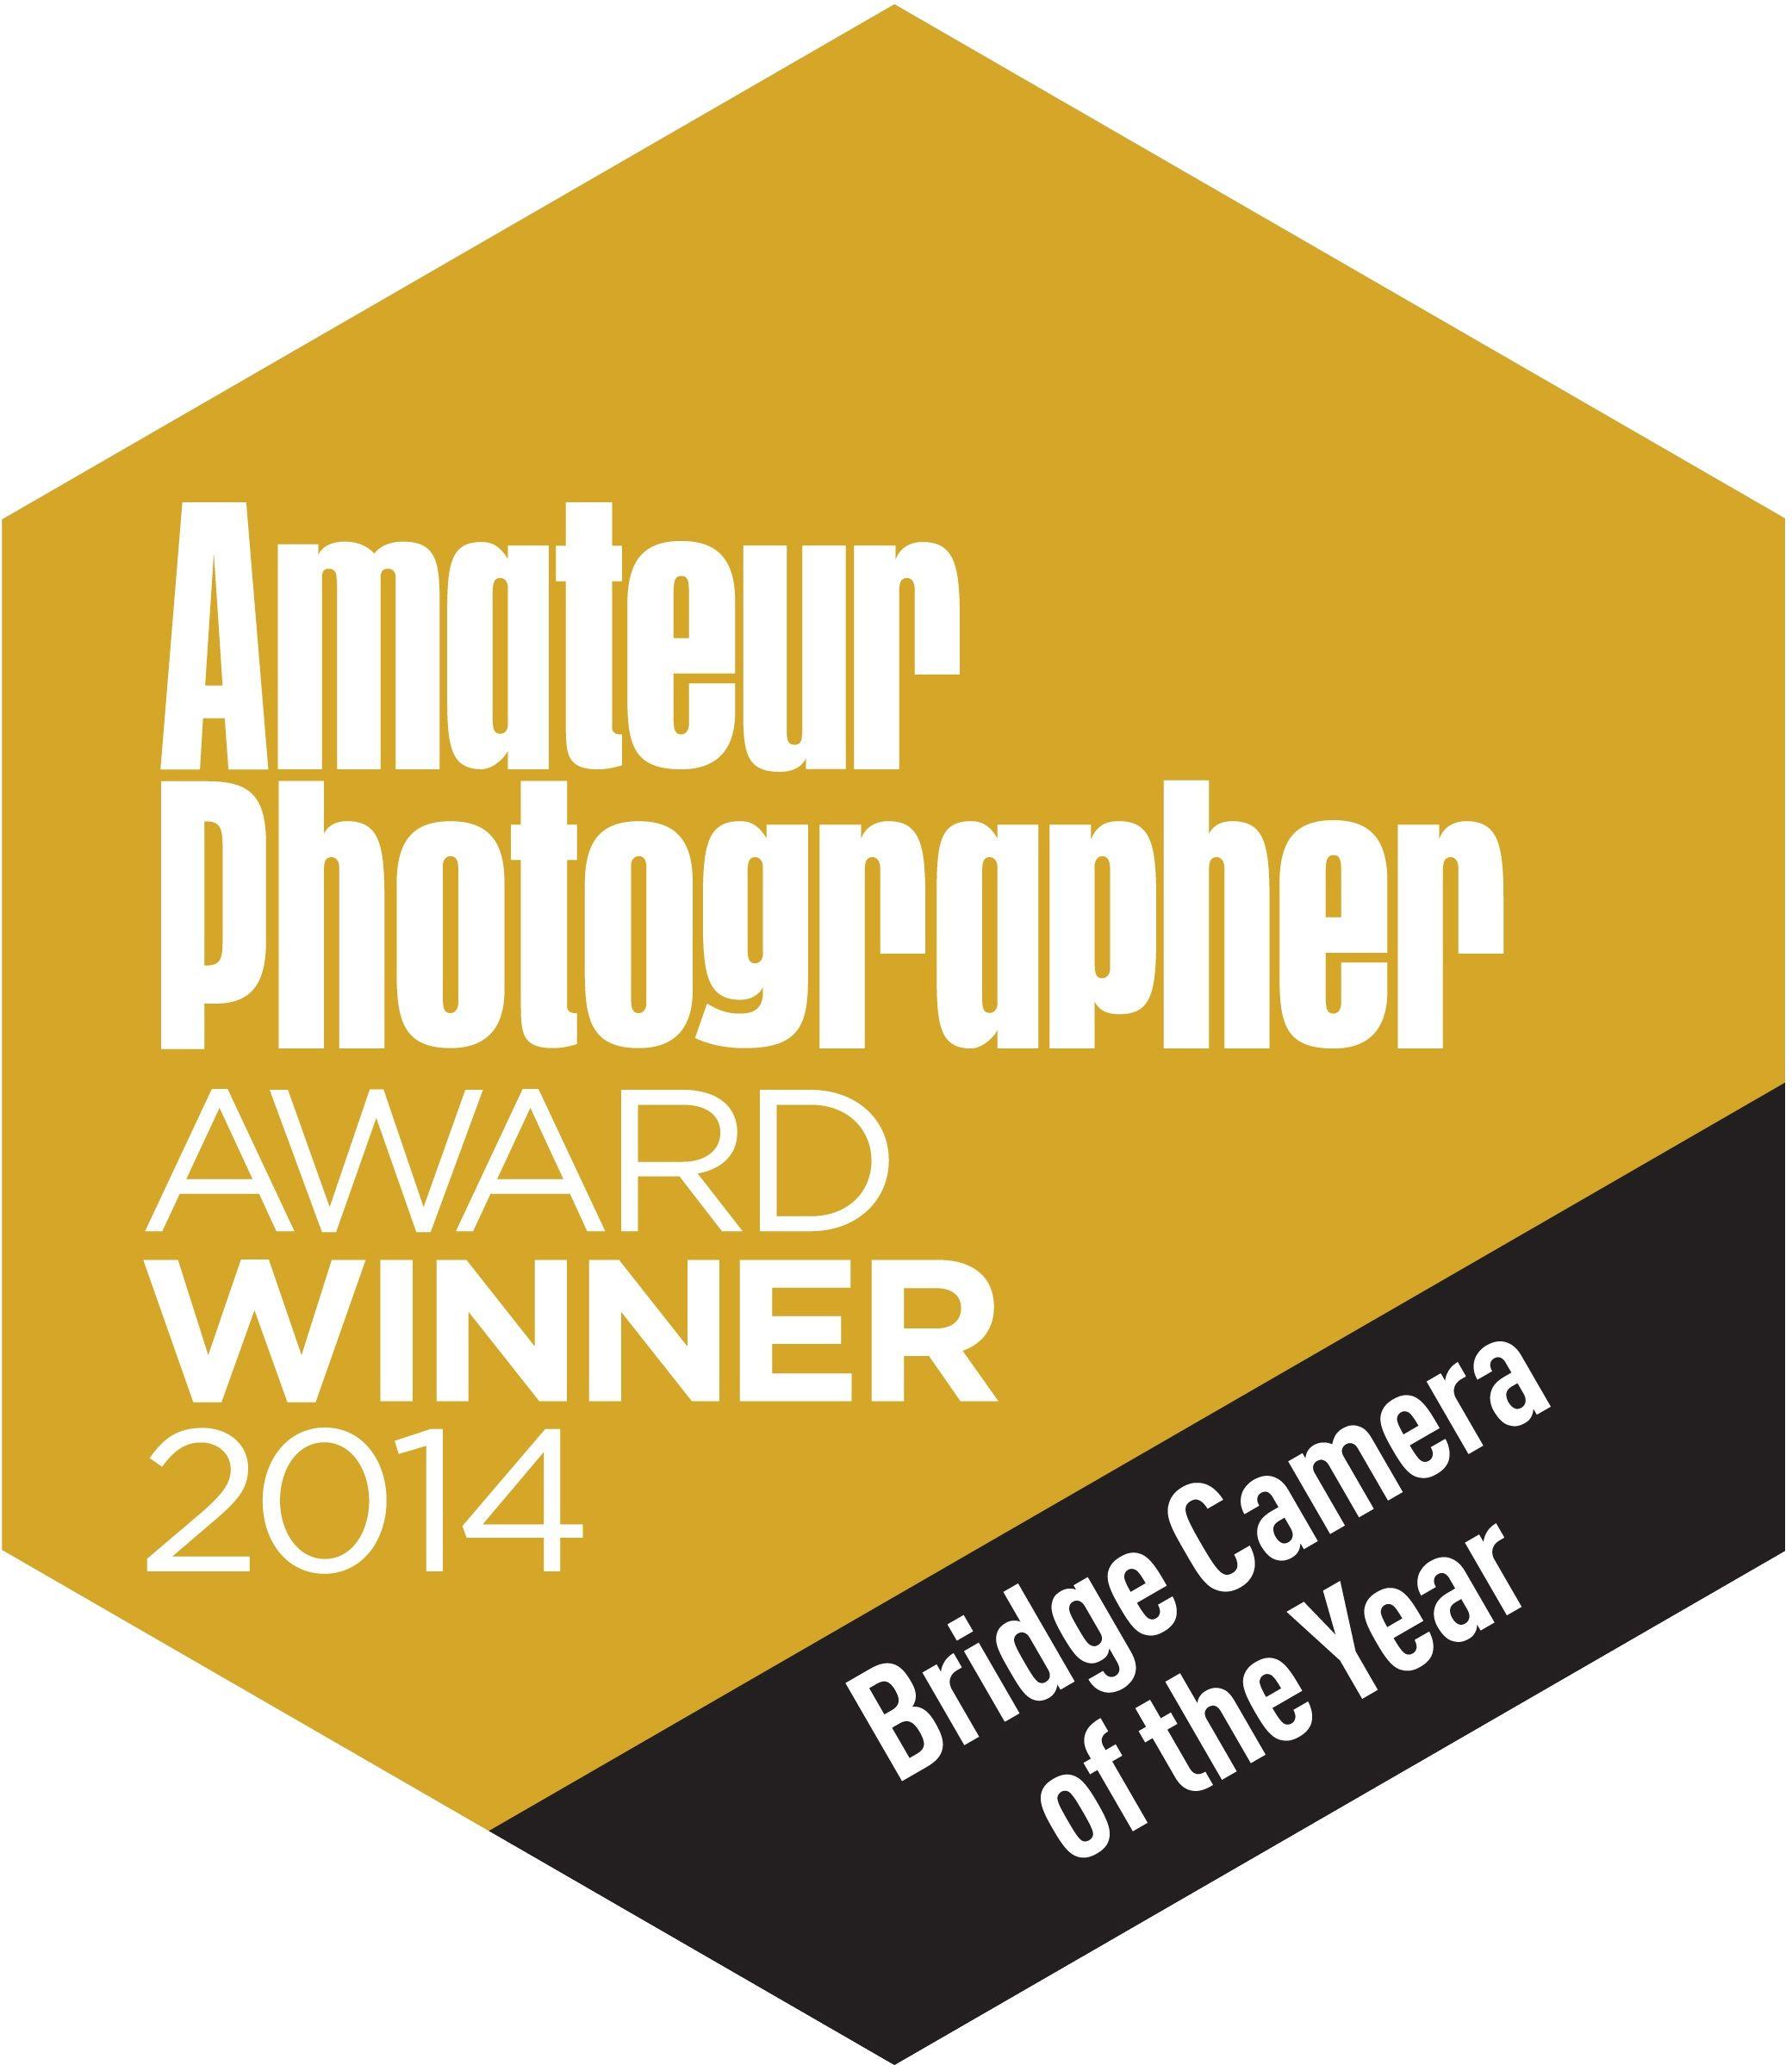 Amateur Photographer Award Winner 2014 - Bridge Camera Of The Year